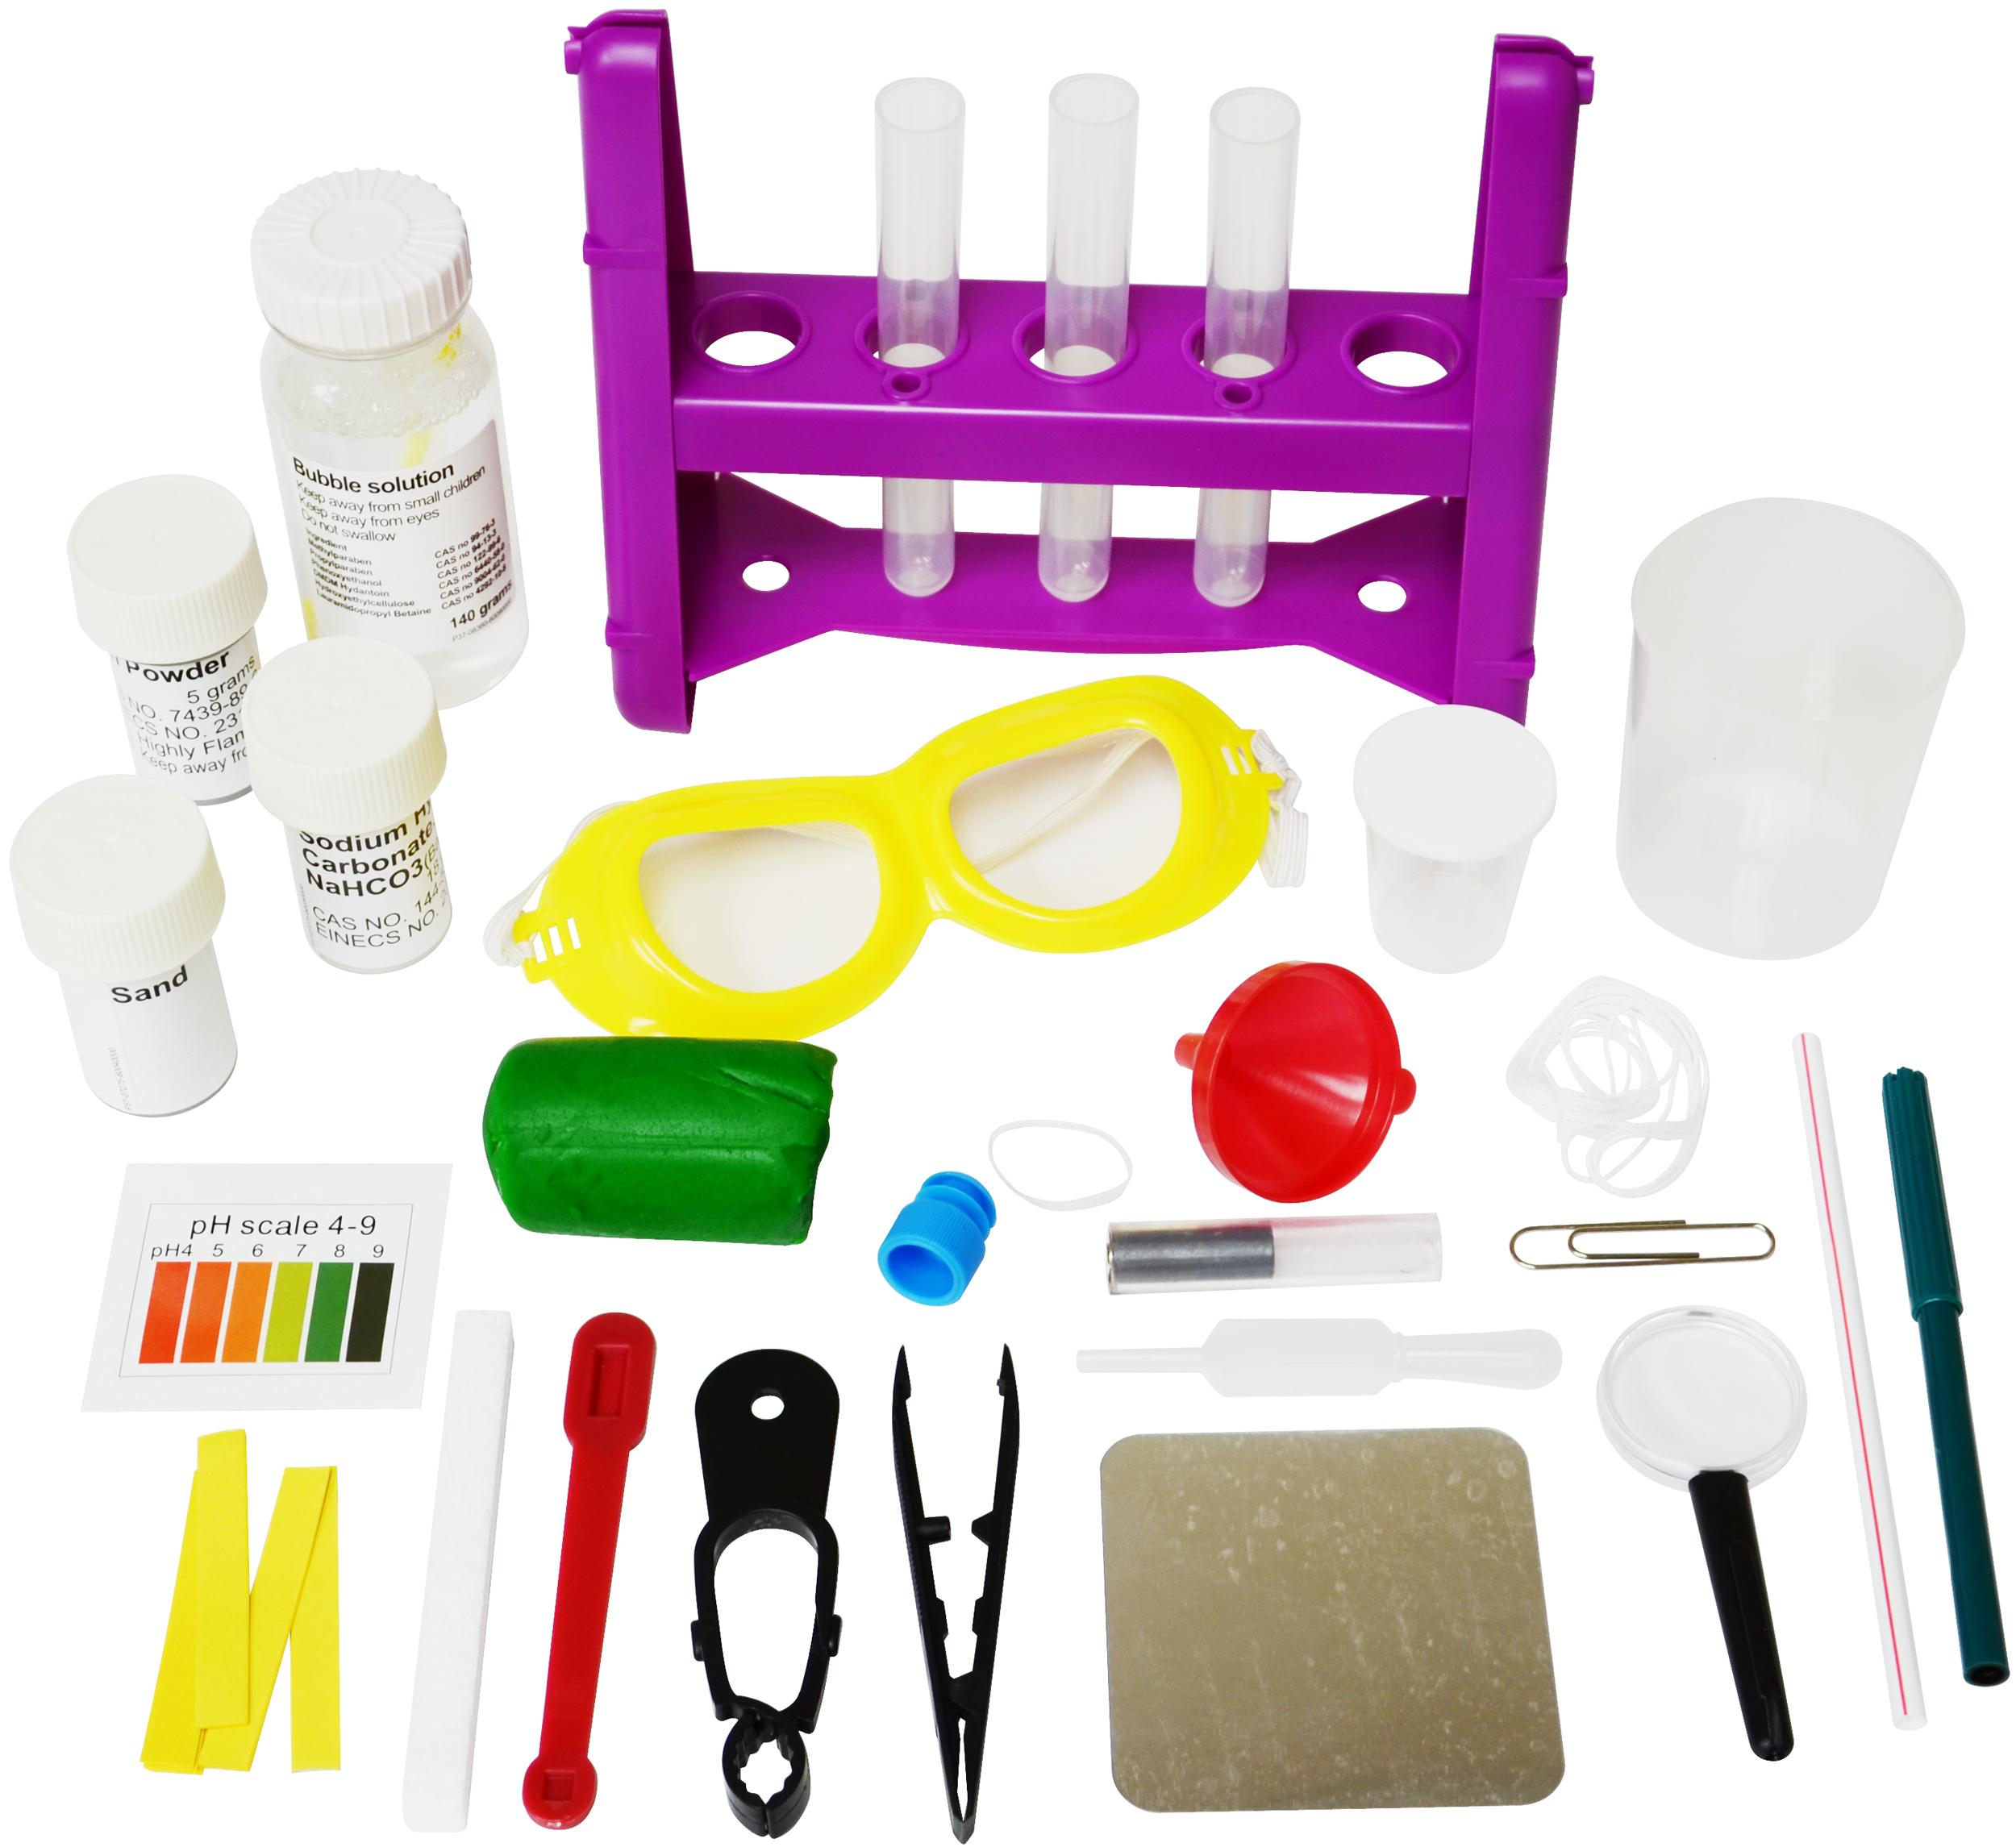 Chem 60 Chemistry Set Electronic Kits Snap Circuits Motion Scm165 Edu7075 2